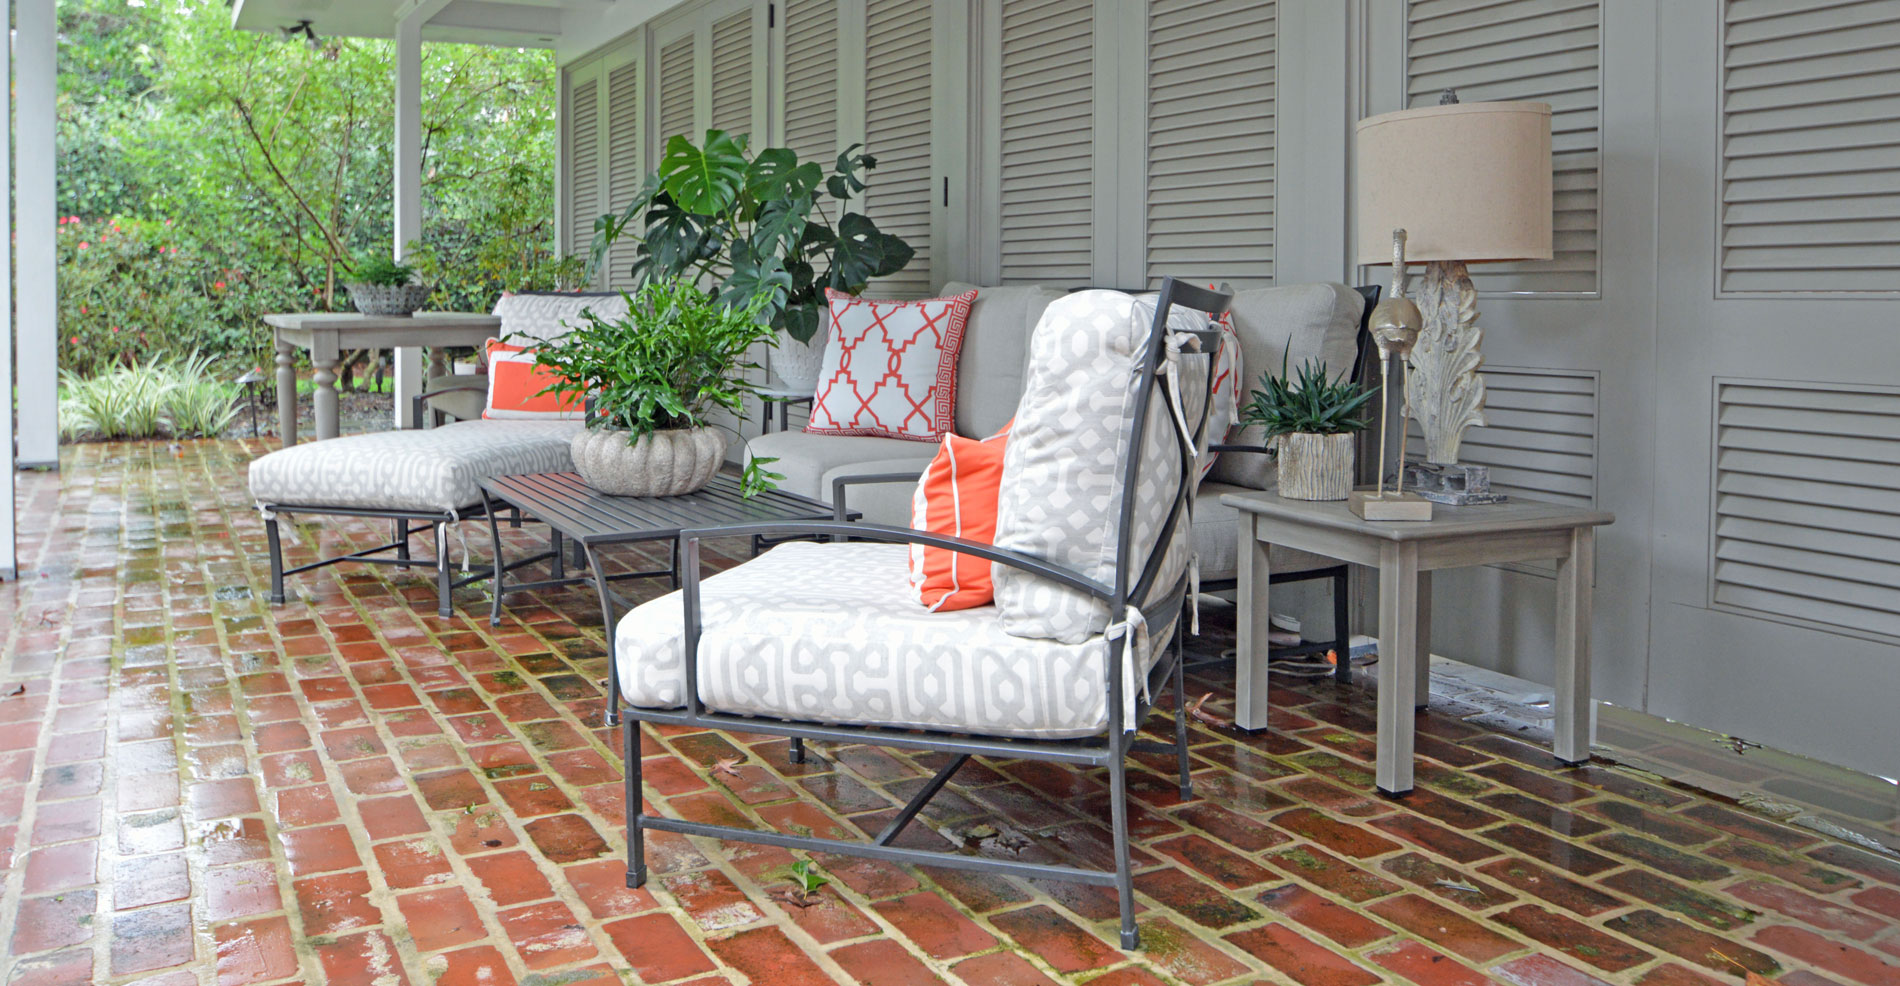 fawley-david2-dixon-smith-interiors-baton-rouge-interior-design-custom-furniture-web-0008